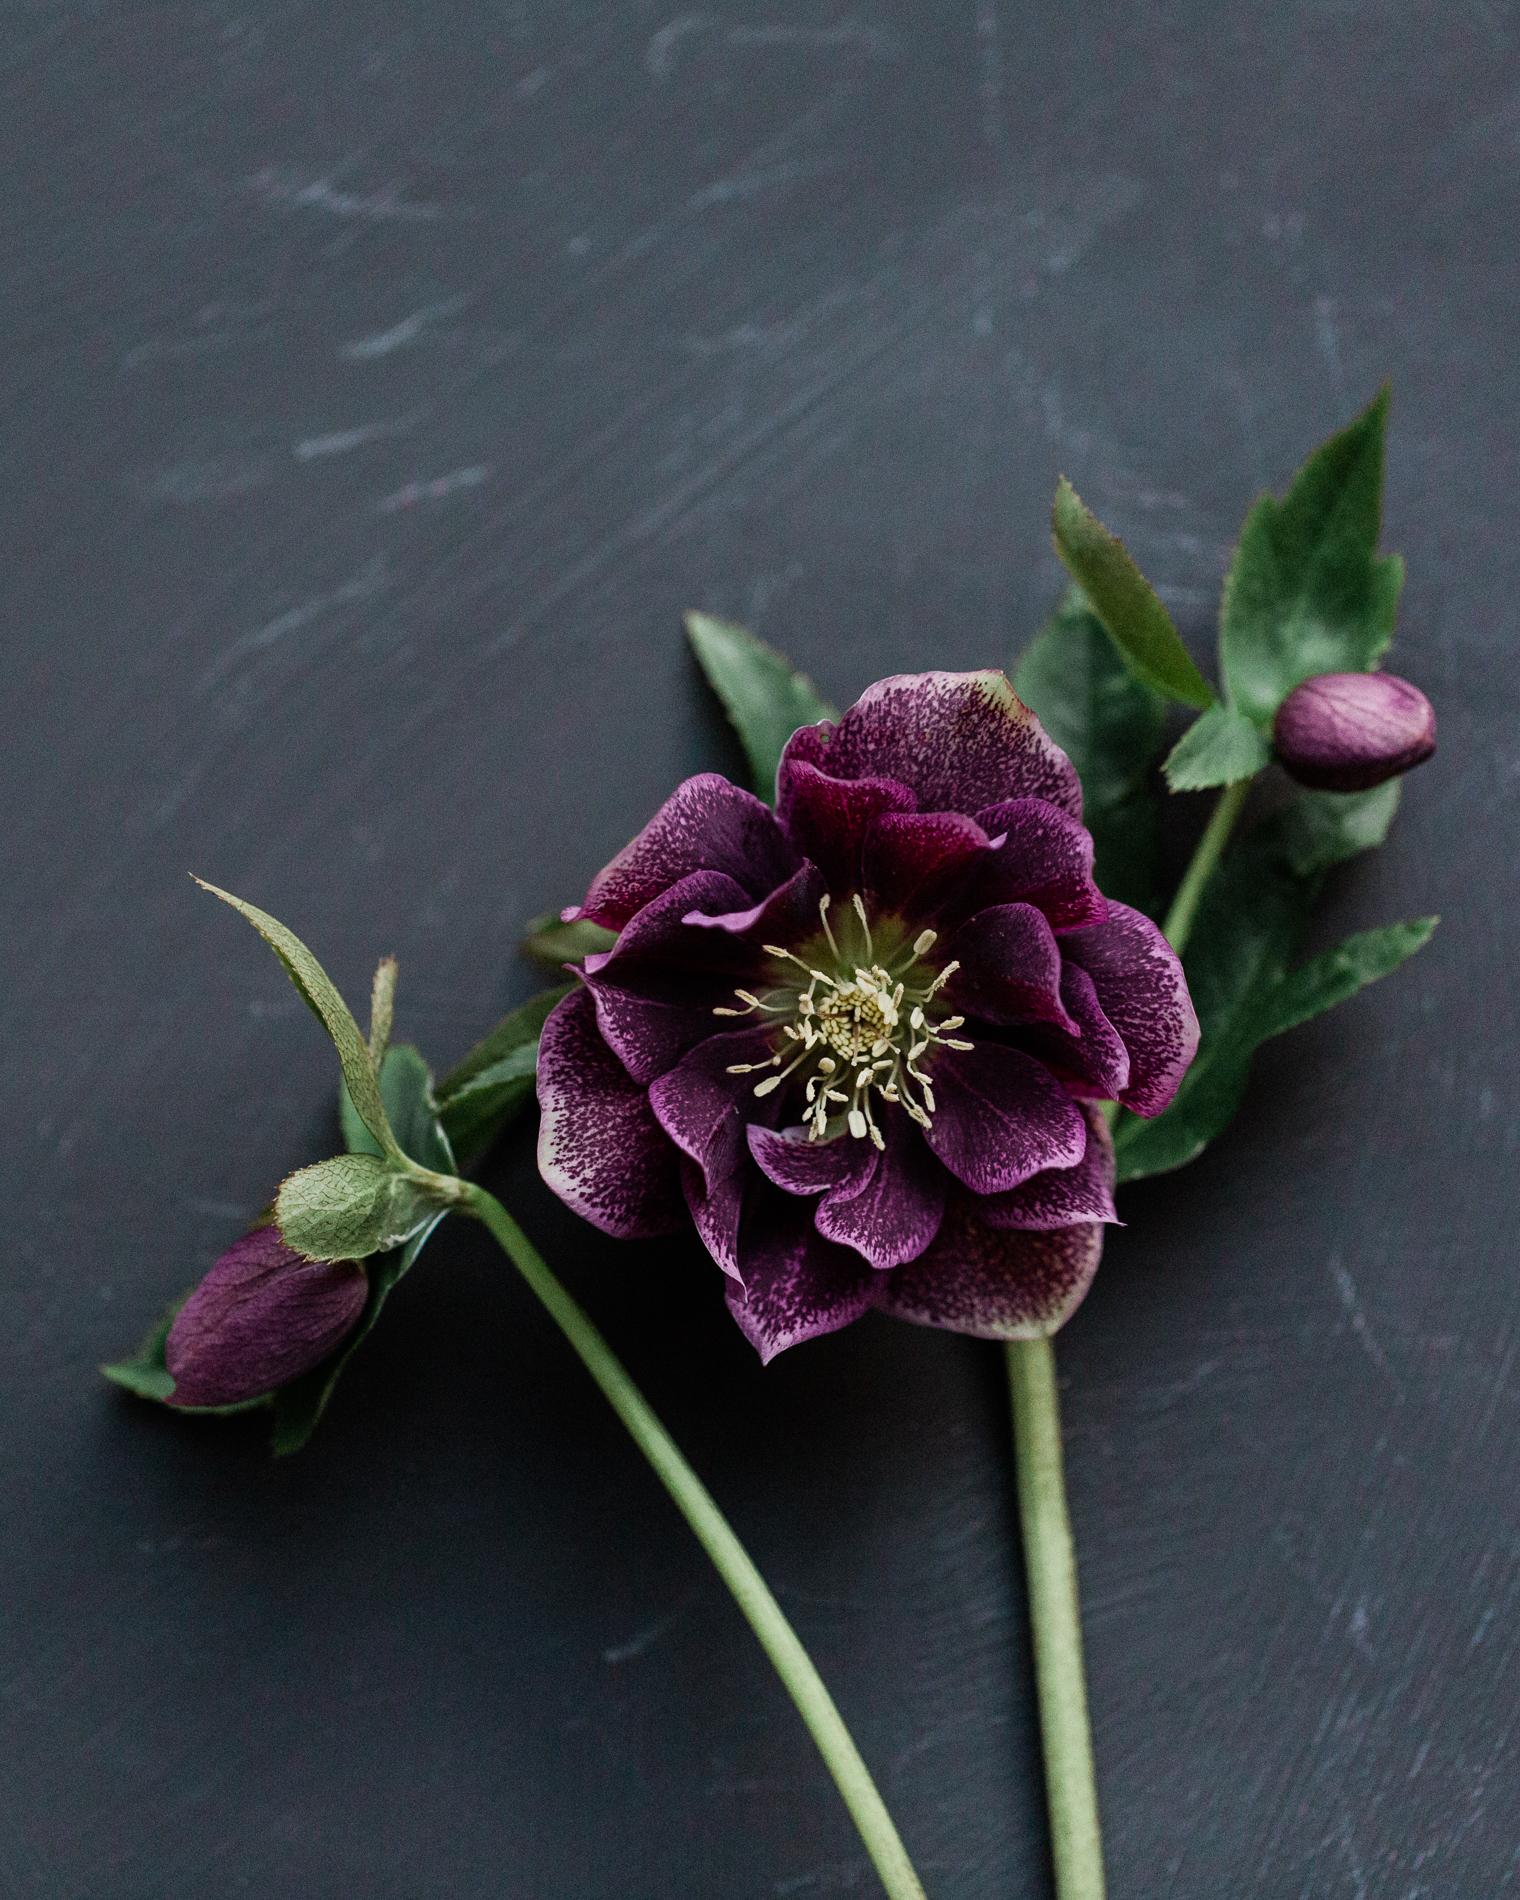 McQueens Opens in John Lewis | Floristry Industry Insight | Hellebore